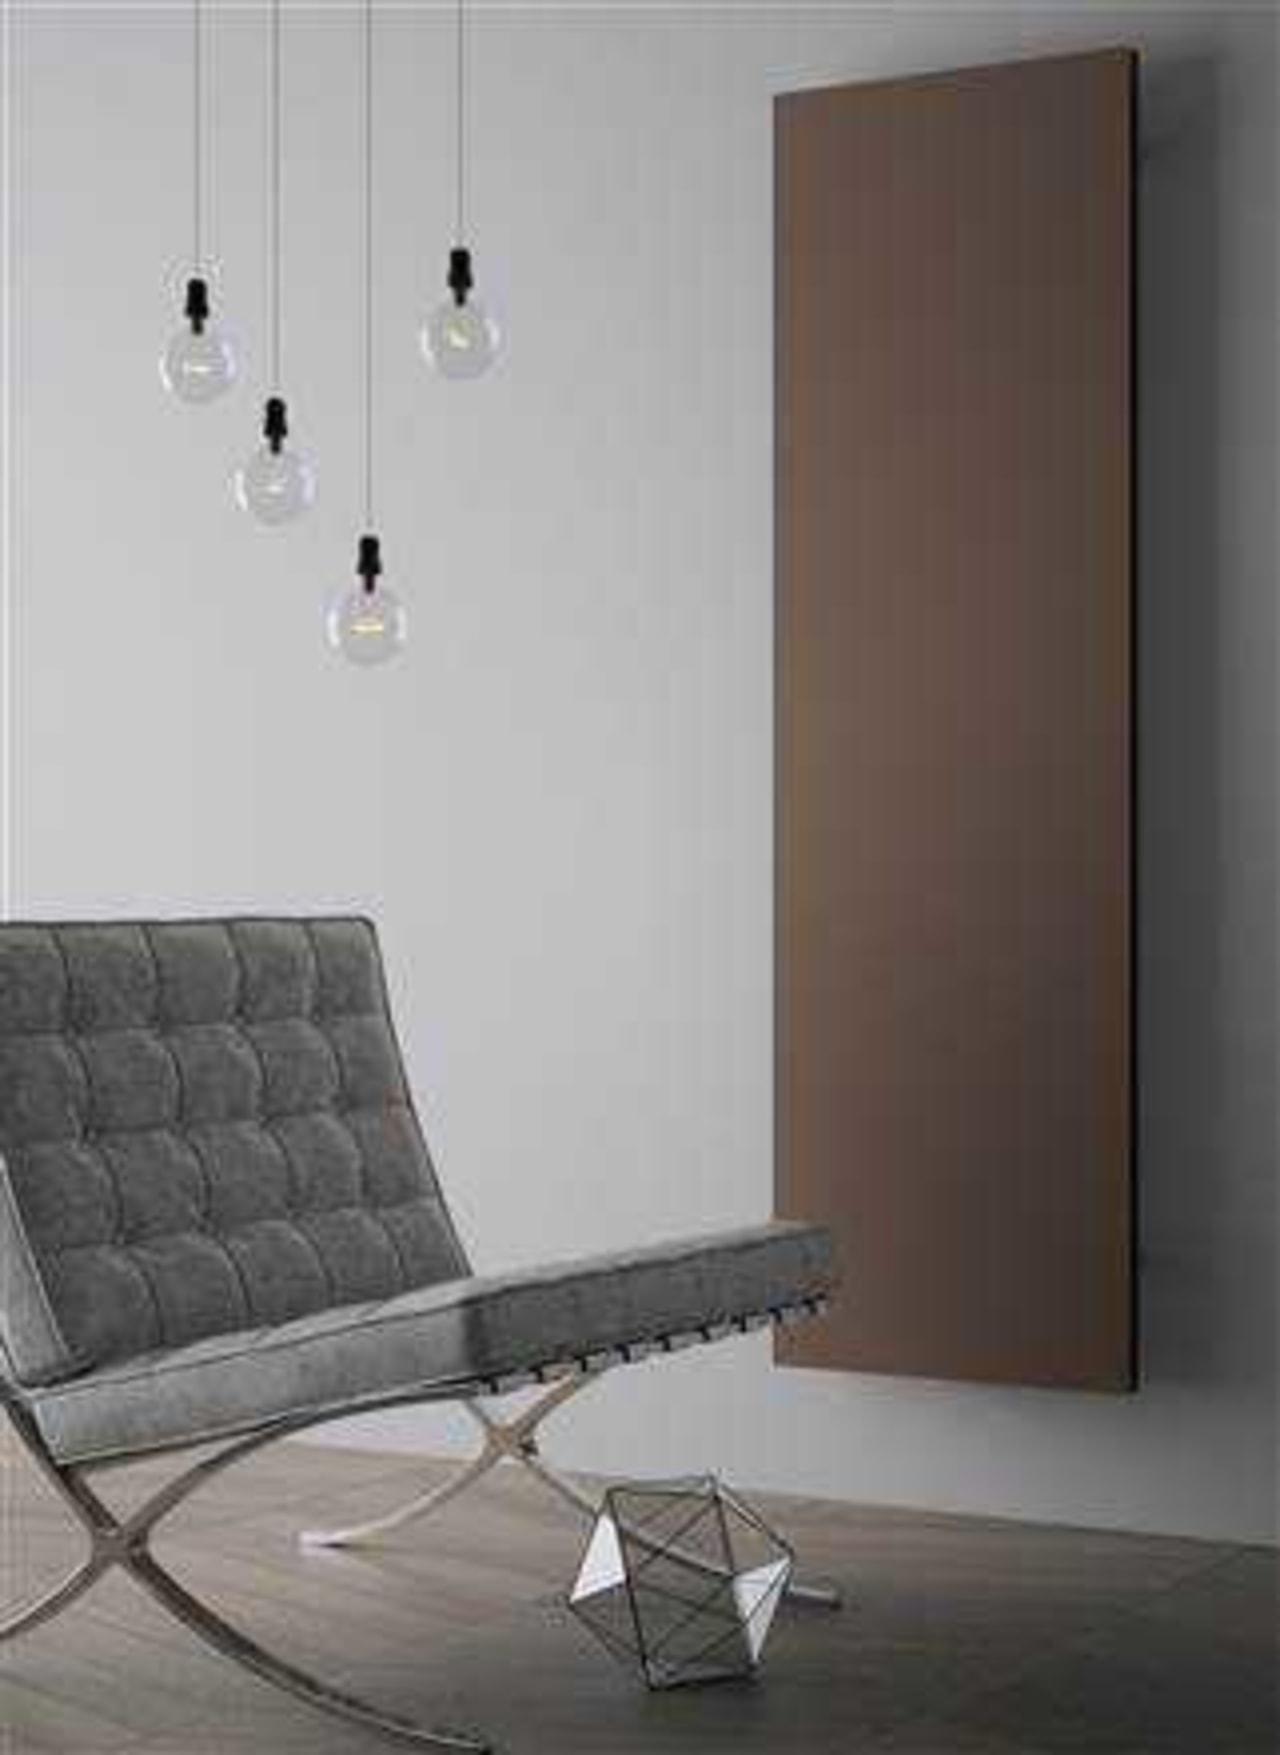 This sleek radiator has a minimal look chair, floor, flooring, furniture, interior design, lamp, light fixture, lighting, product, table, wall, gray, black